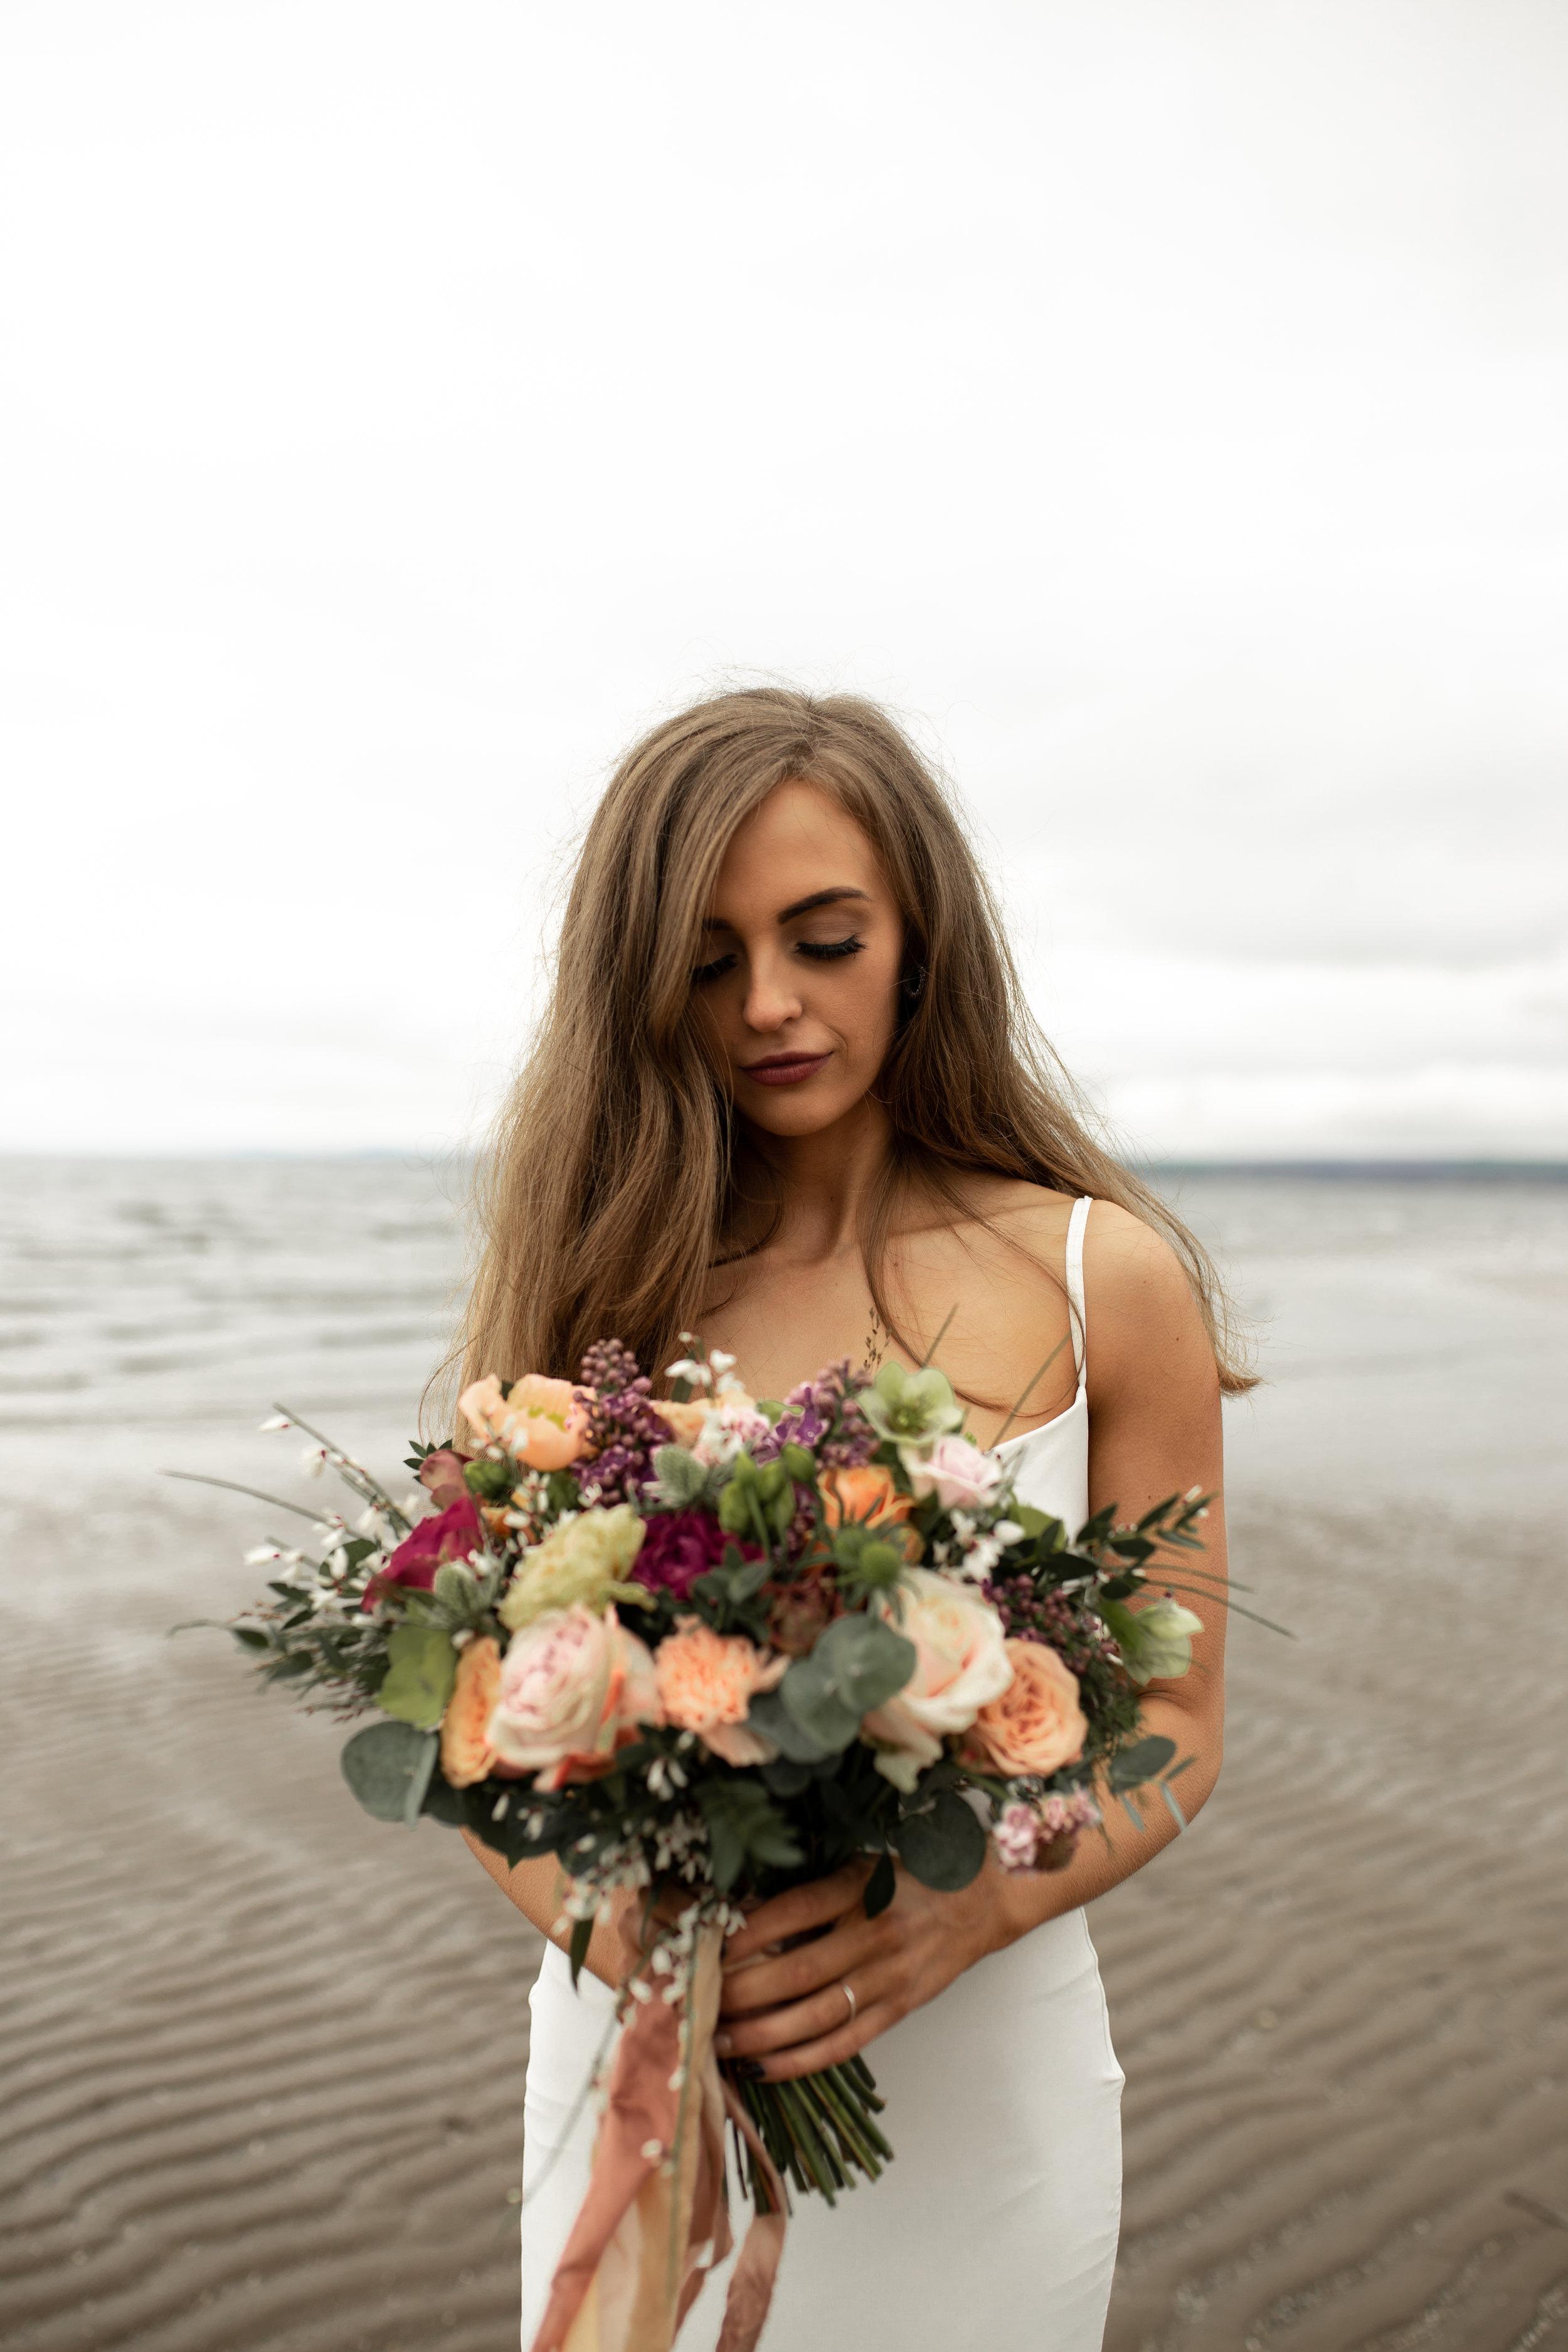 Paula_Russell_Photography_Edinburgh_Wedding_BBonnie_Flowers_10